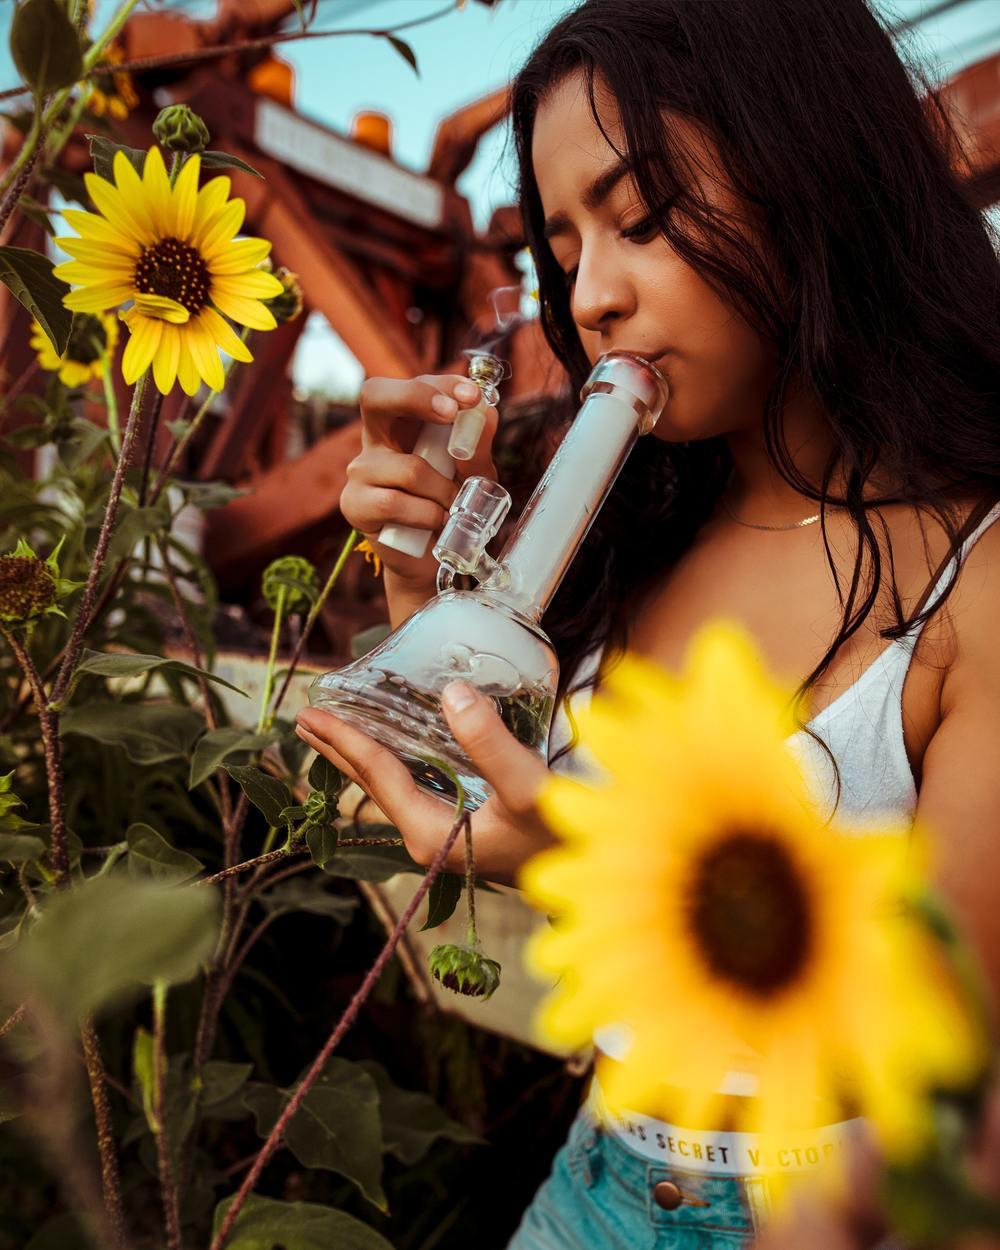 Person smoking a glass bong among sunflowers